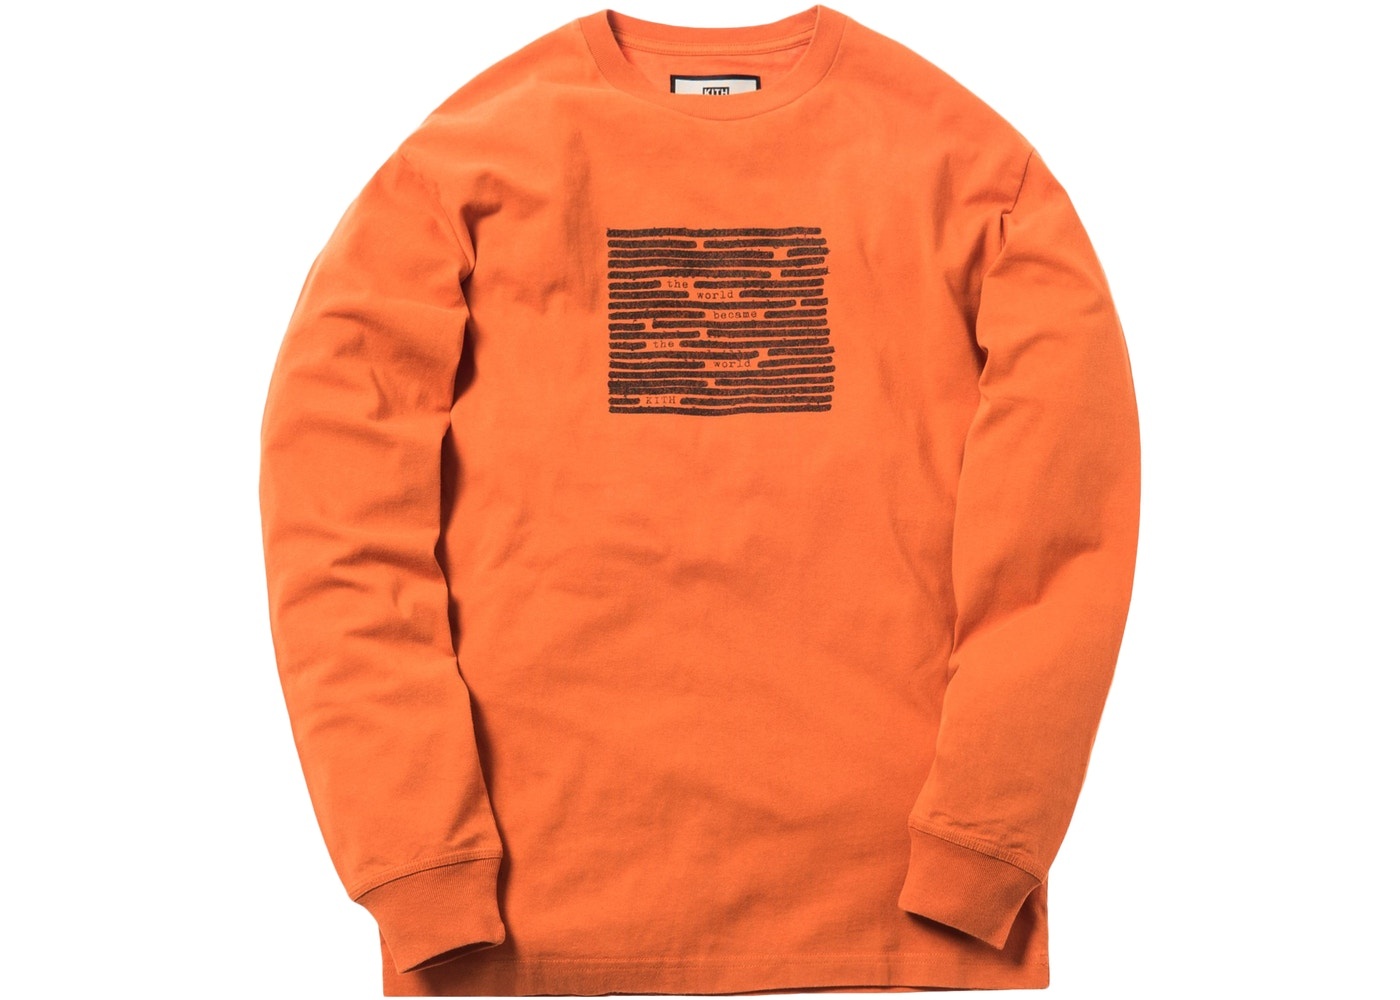 Kith Edits L S Tee Orange - FW18 0ee4c586182